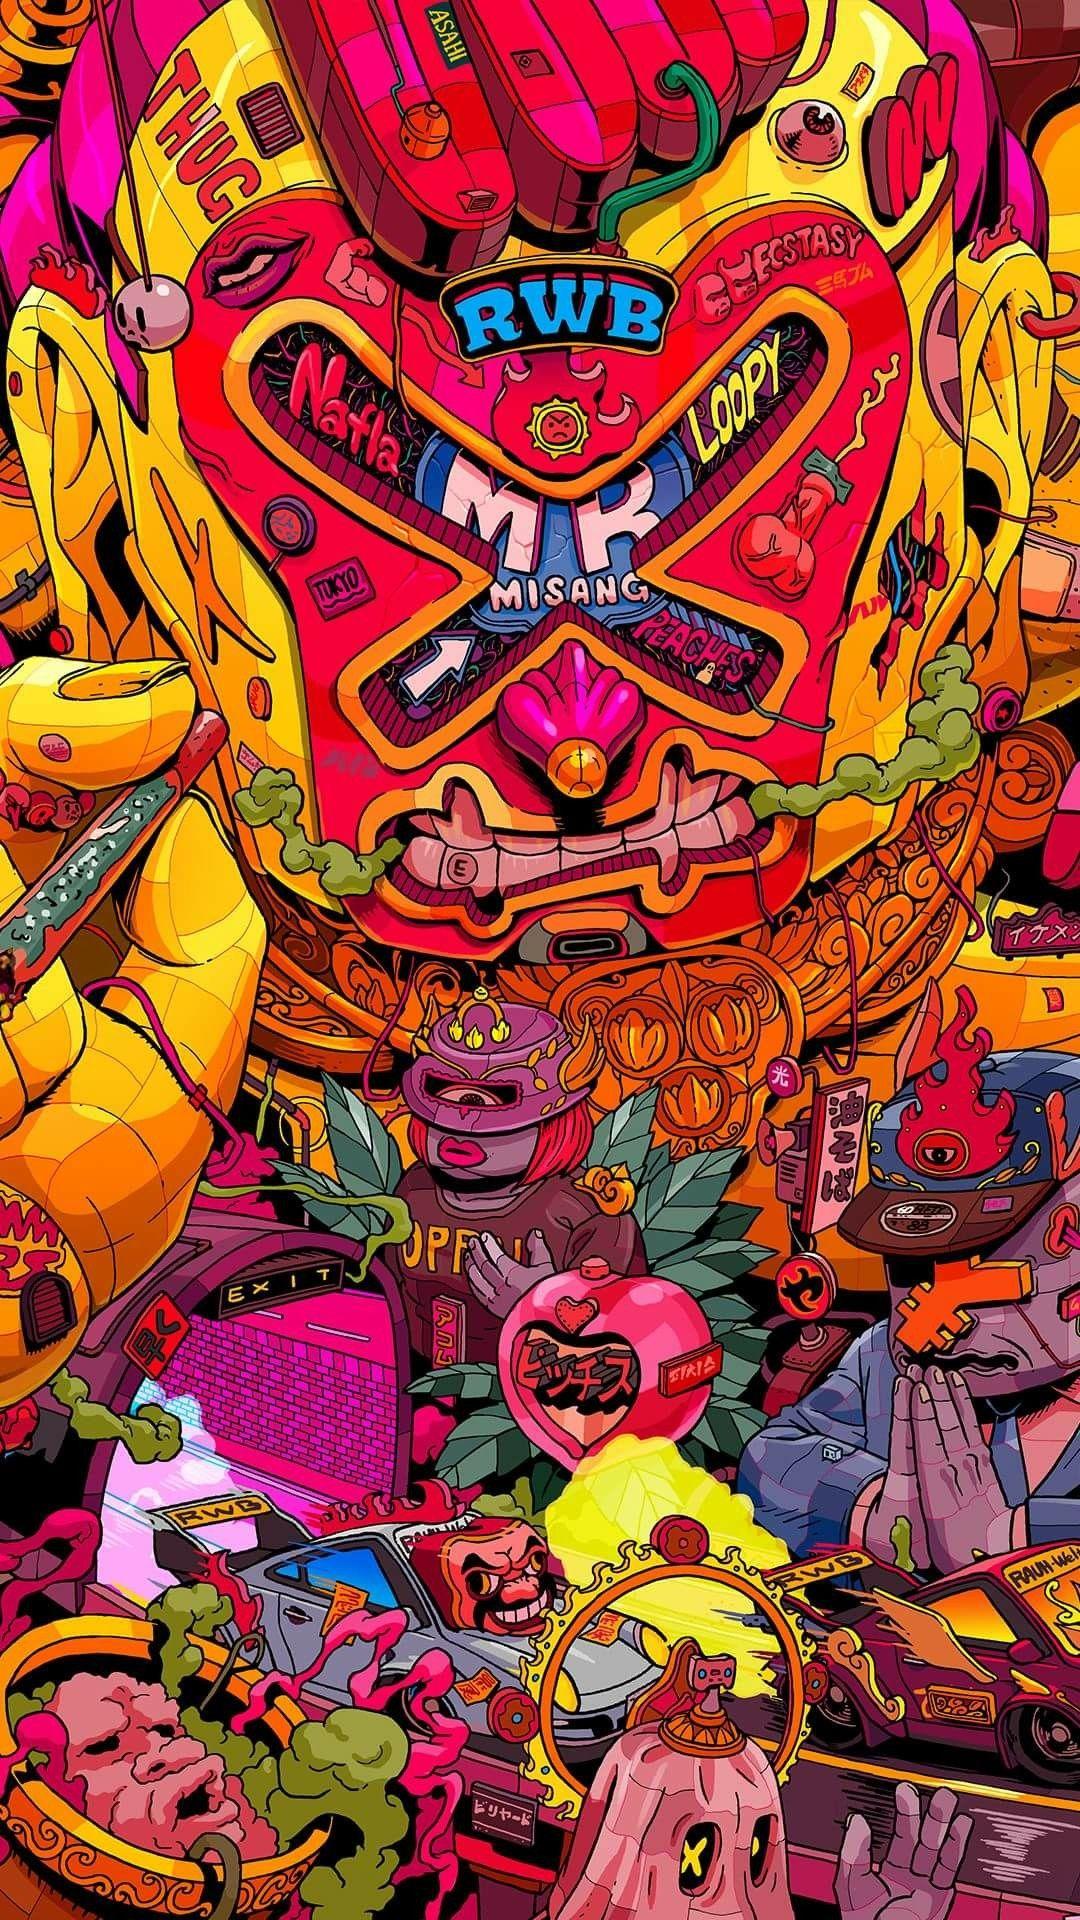  Mr. Misang 2/4    Pop art wallpaper, Japanese pop art ...